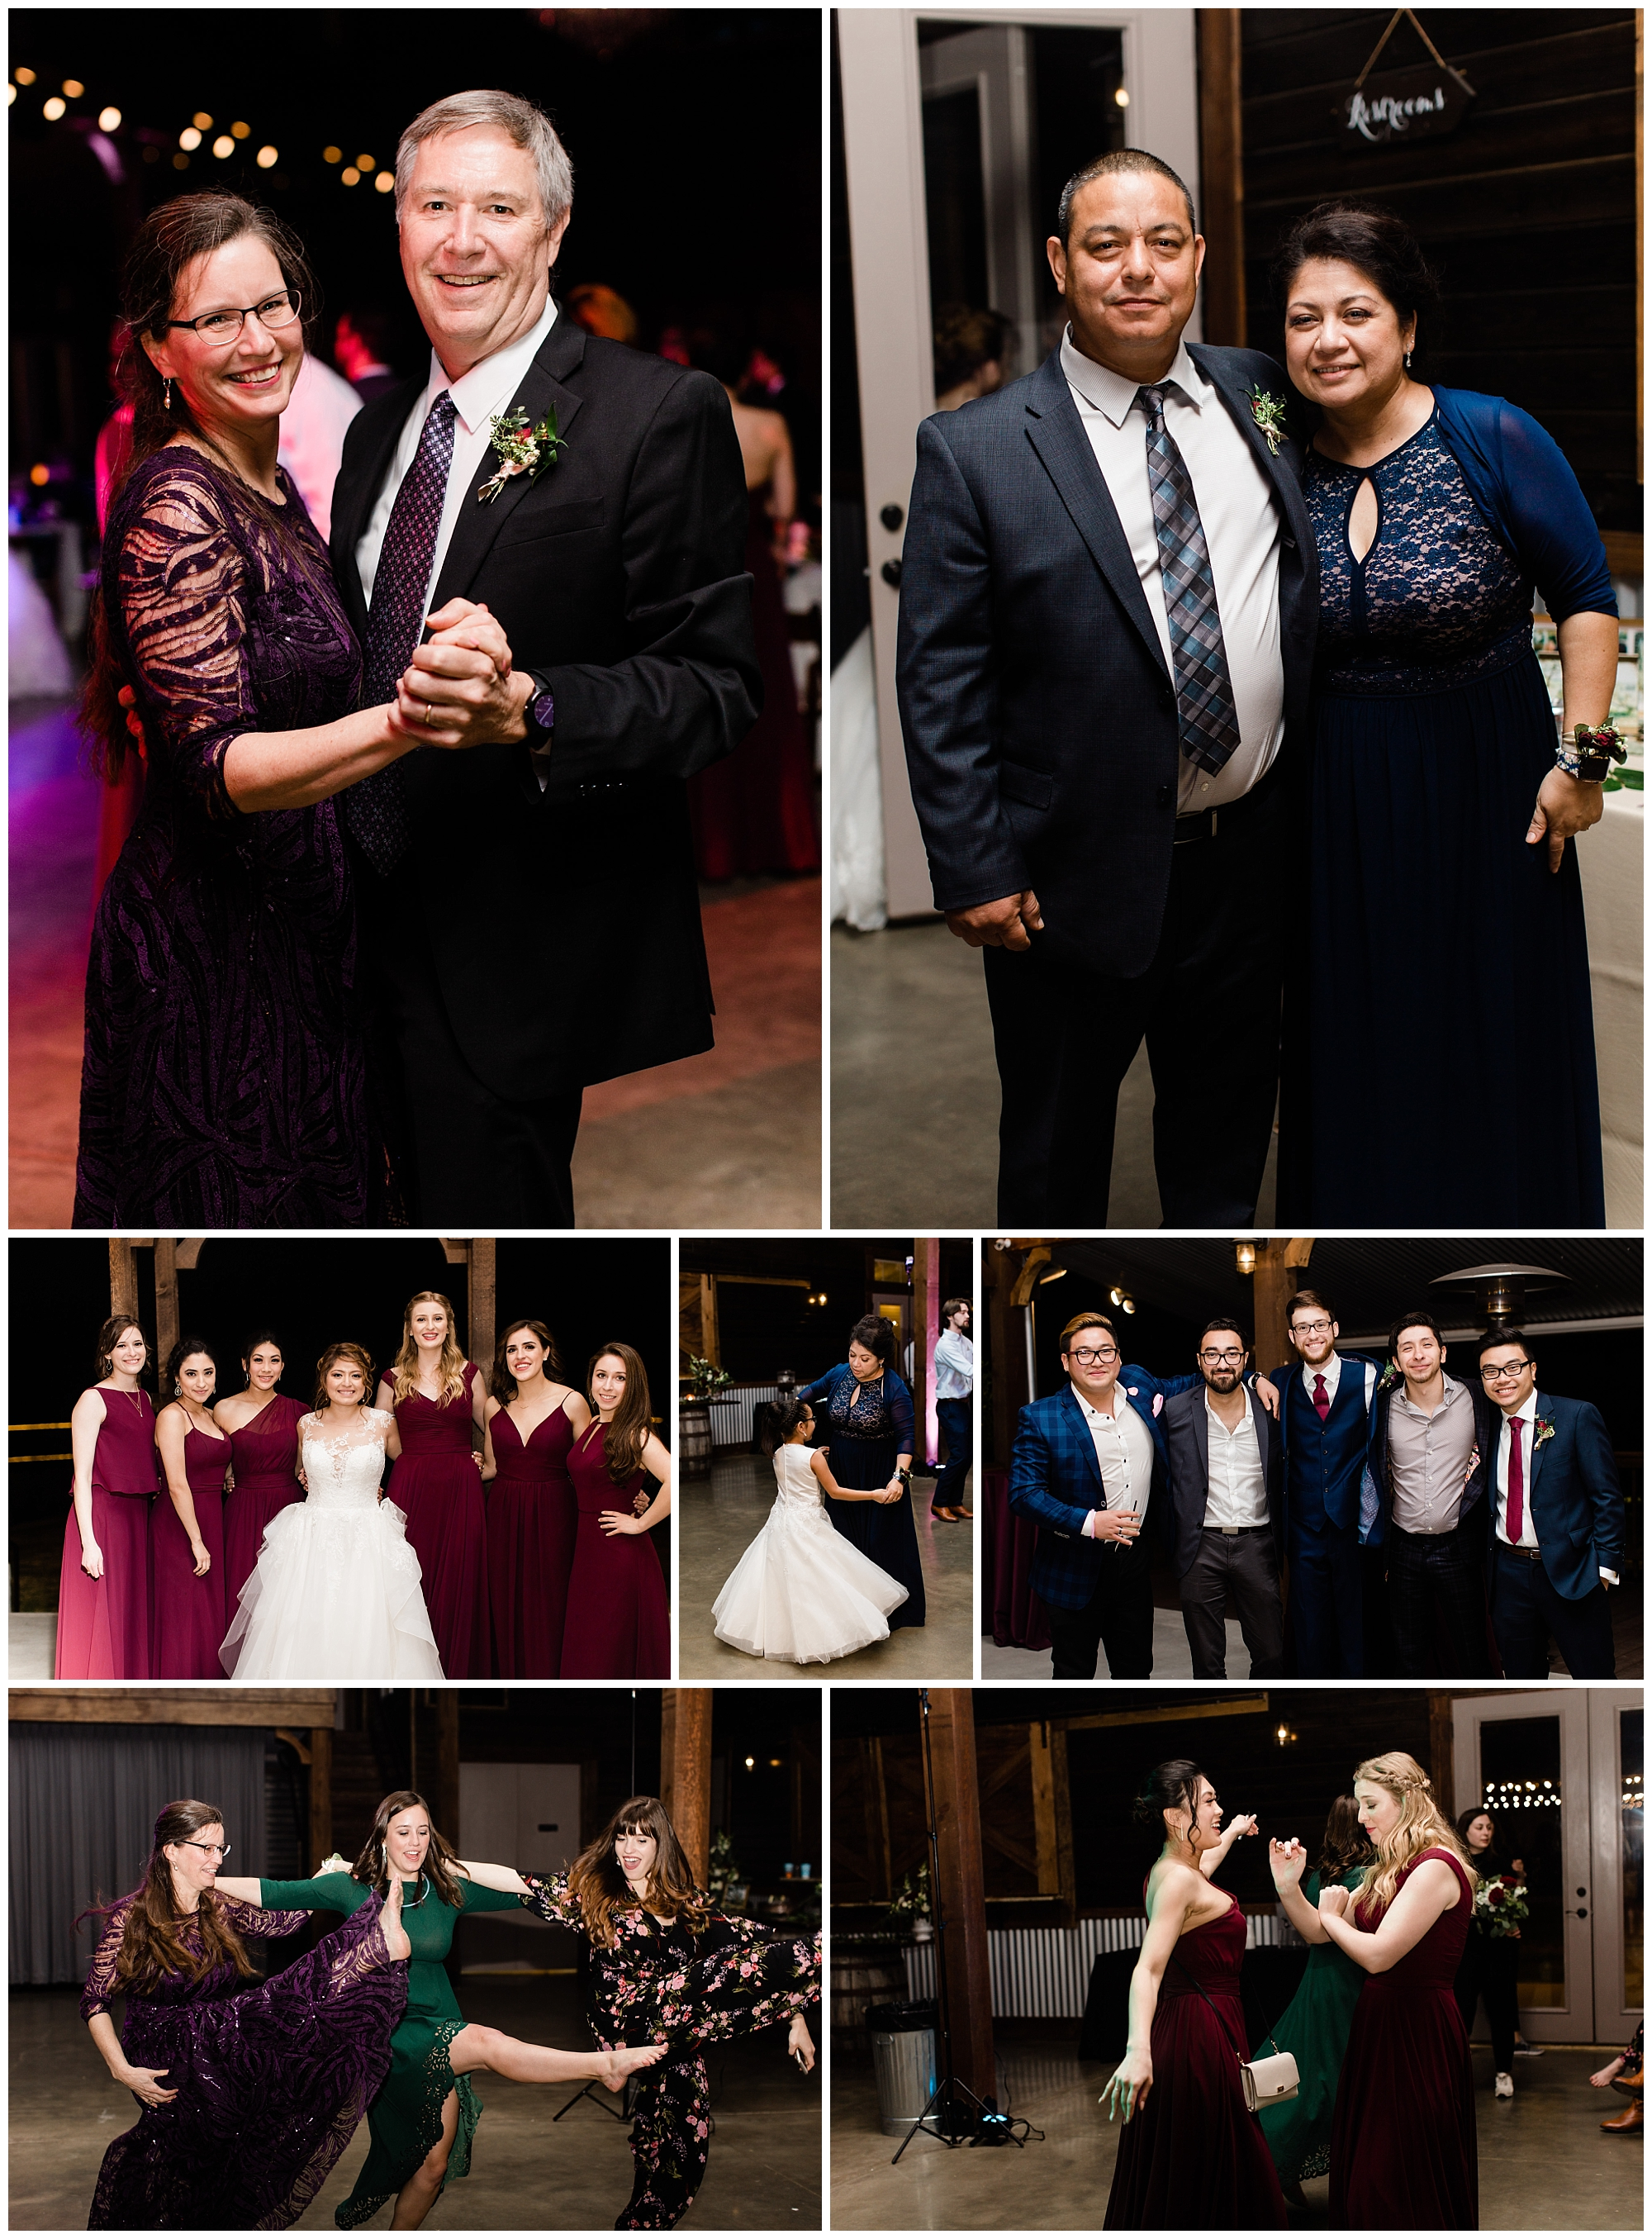 Peach_Creek_Ranch_Wedding_Kristina_Ross_Photography_0033.jpg